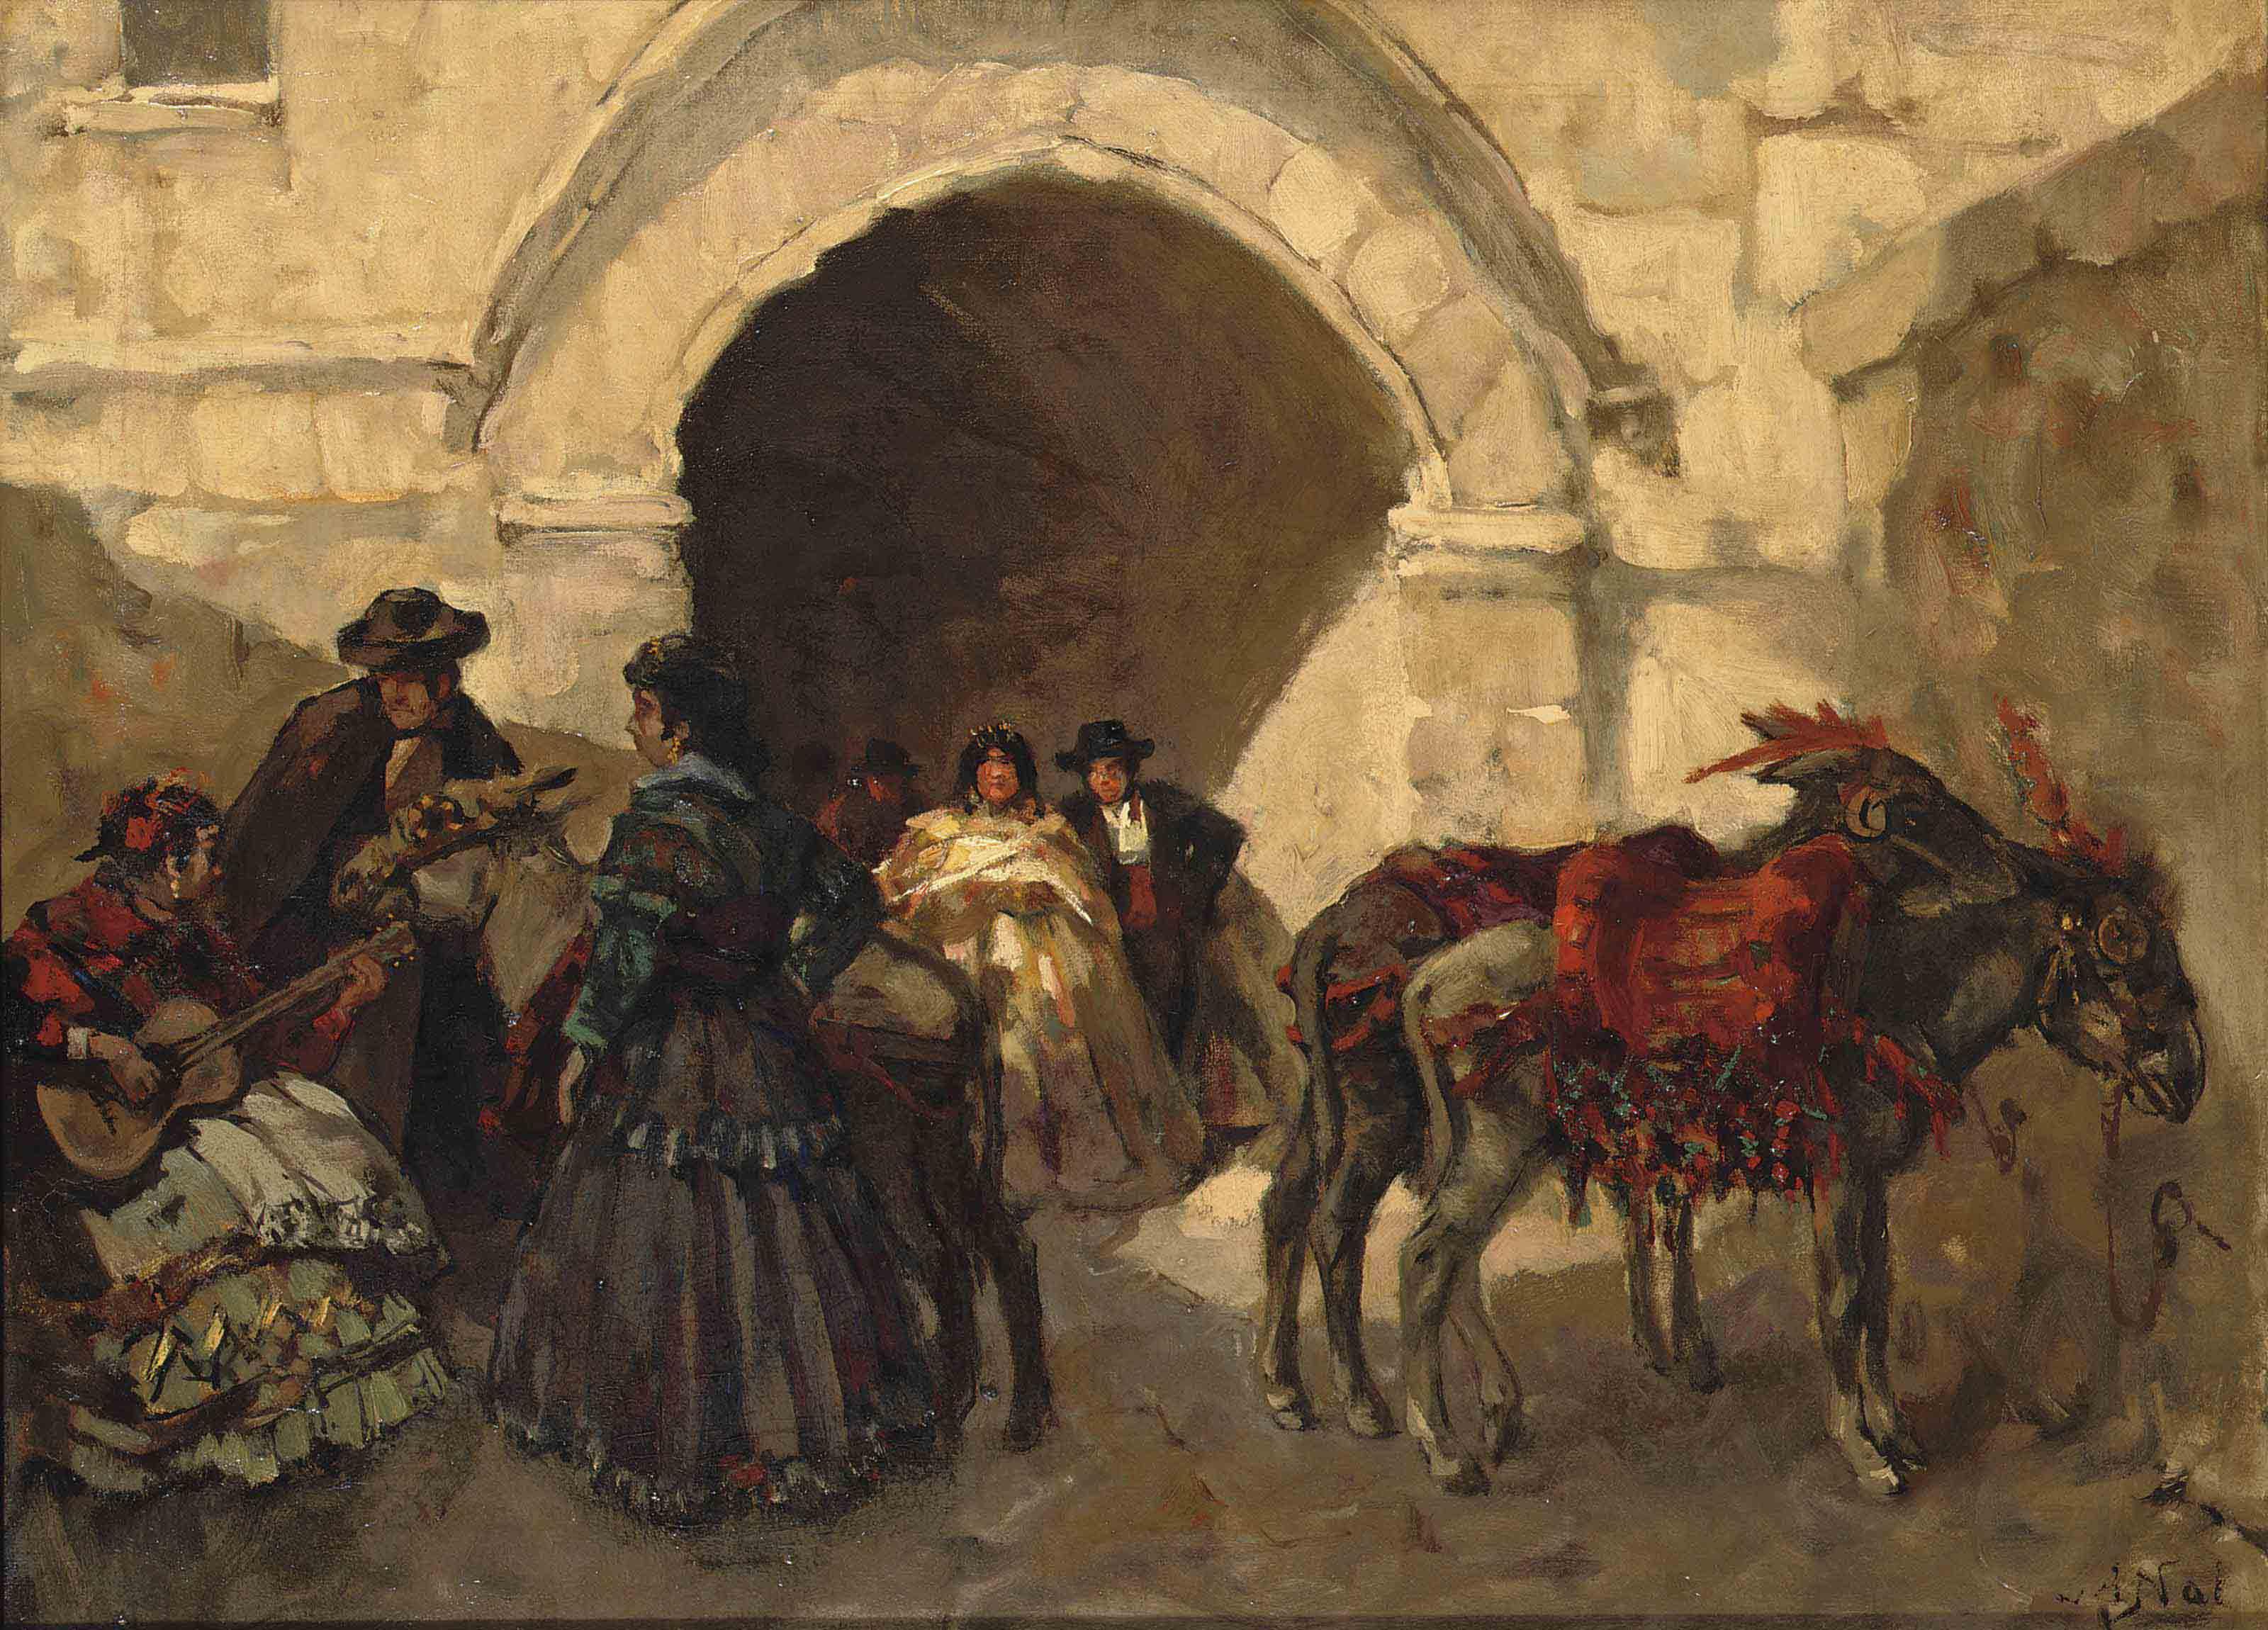 Festivities in a Spanish village